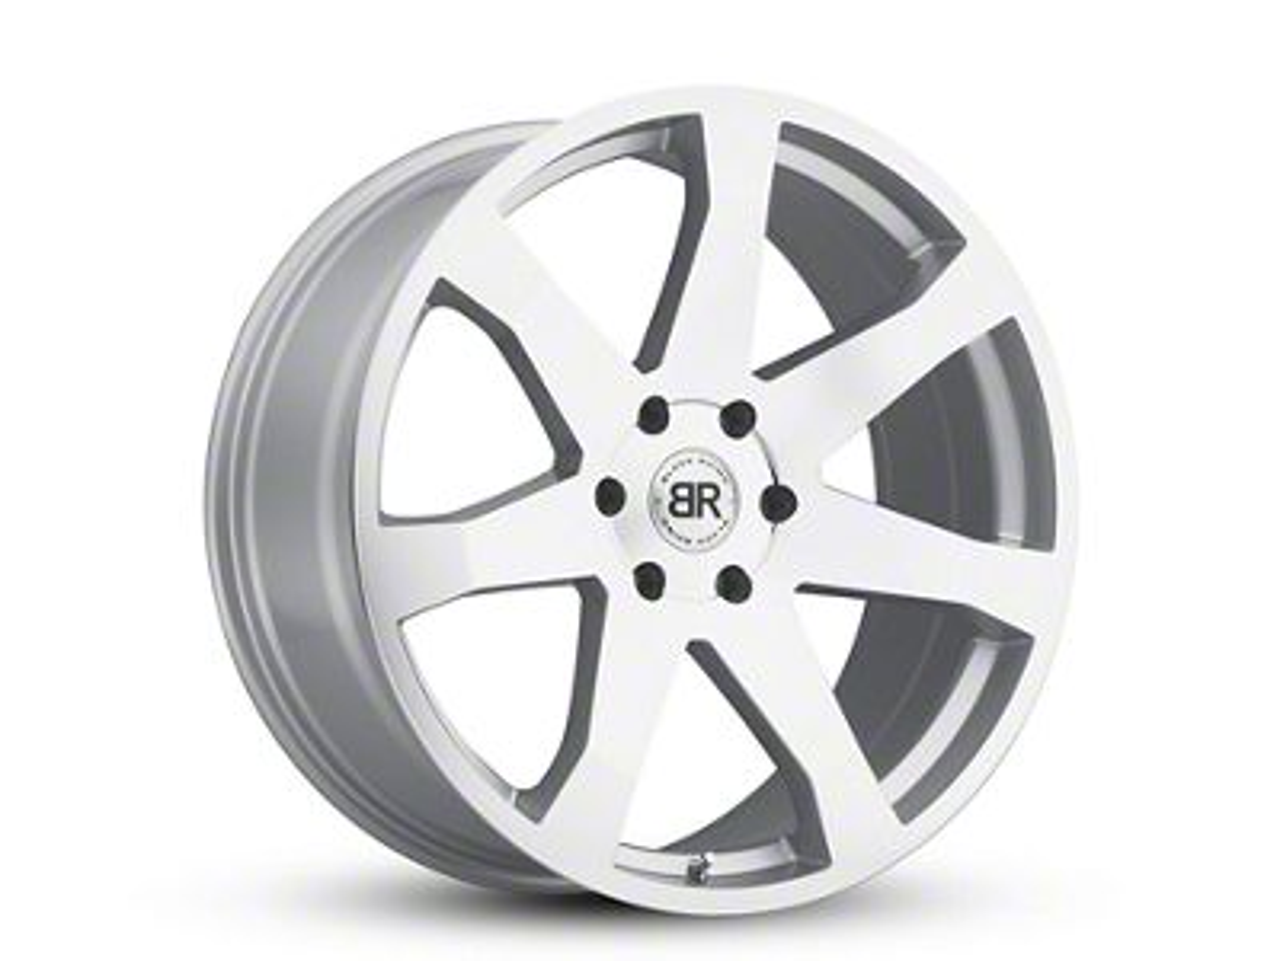 Black Rhino Mozambique Silver 6-Lug Wheel - 22x9.5 (99-18 Silverado 1500)